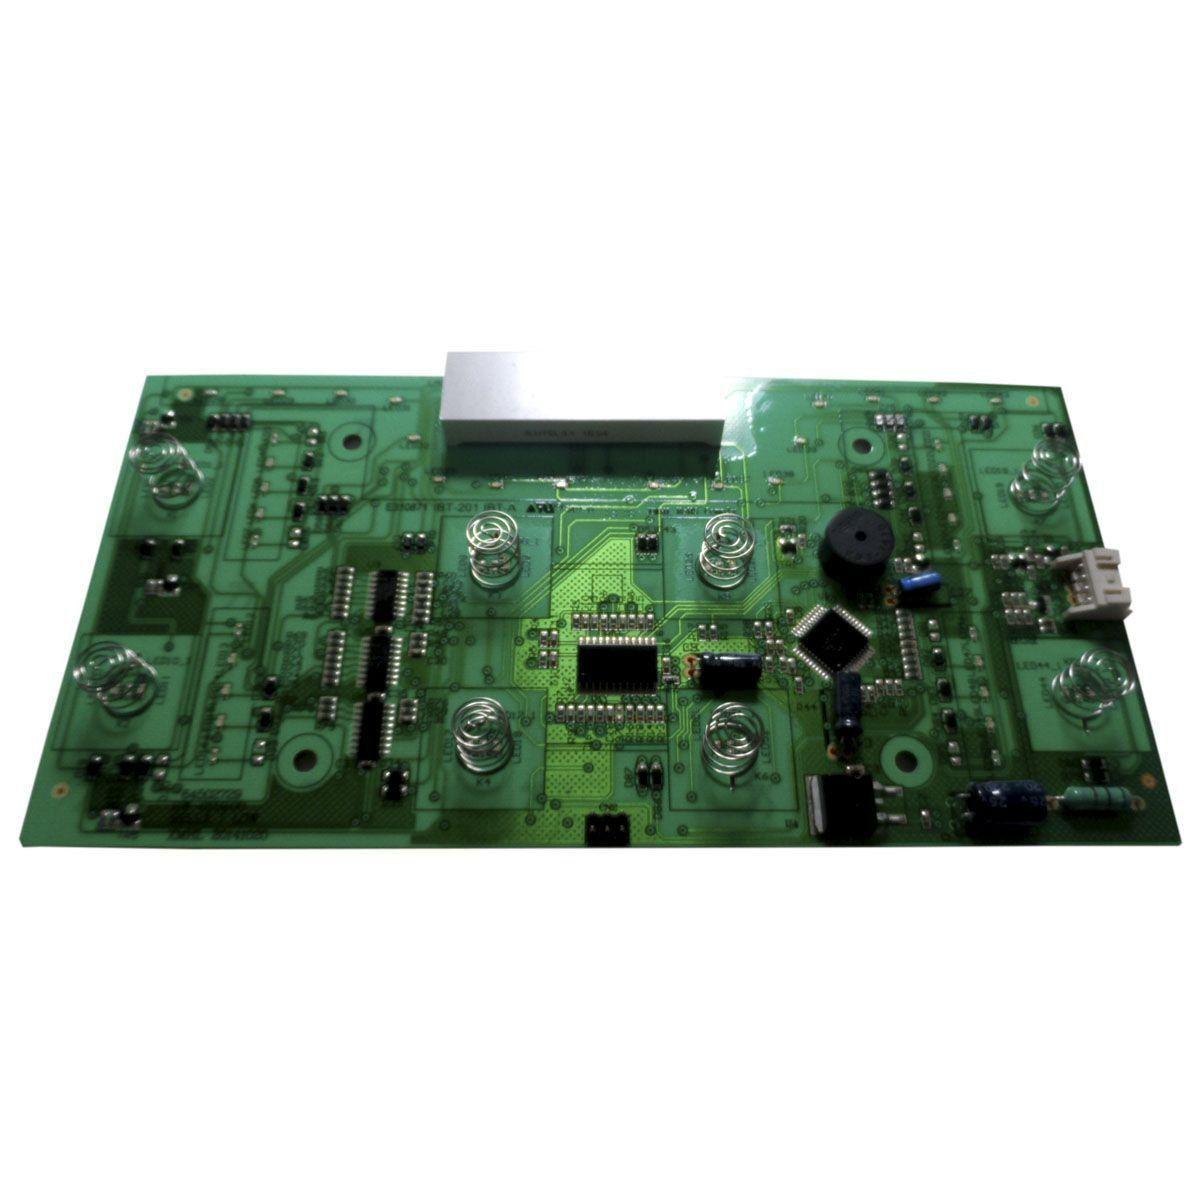 Placa Eletrônica Interface Refrigerador Electrolux Inverse 64502729